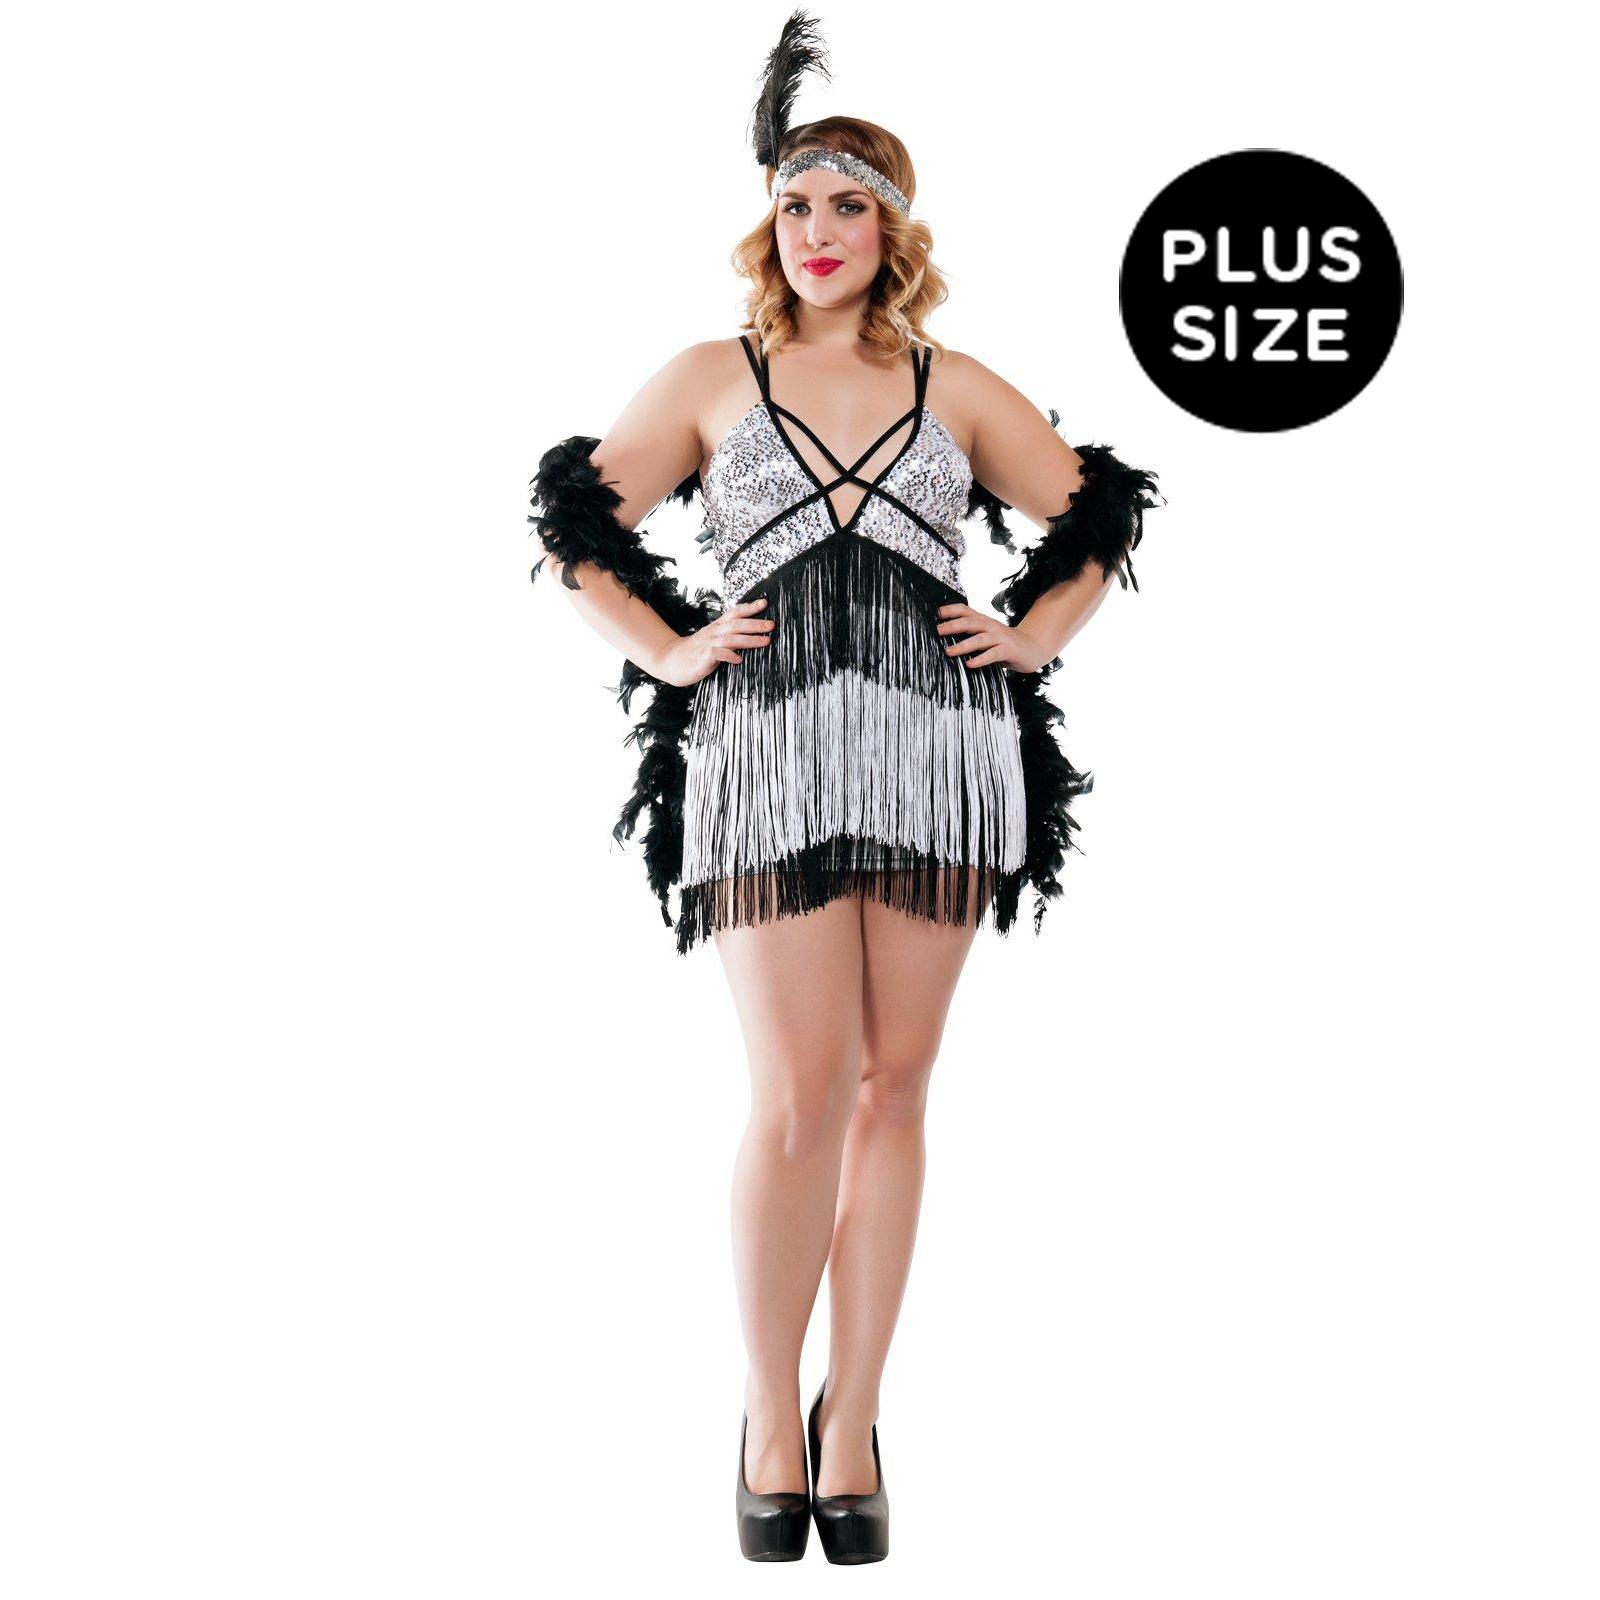 Boardwalk Flapper Costume for Plus Size Women   BuyCostumes.com